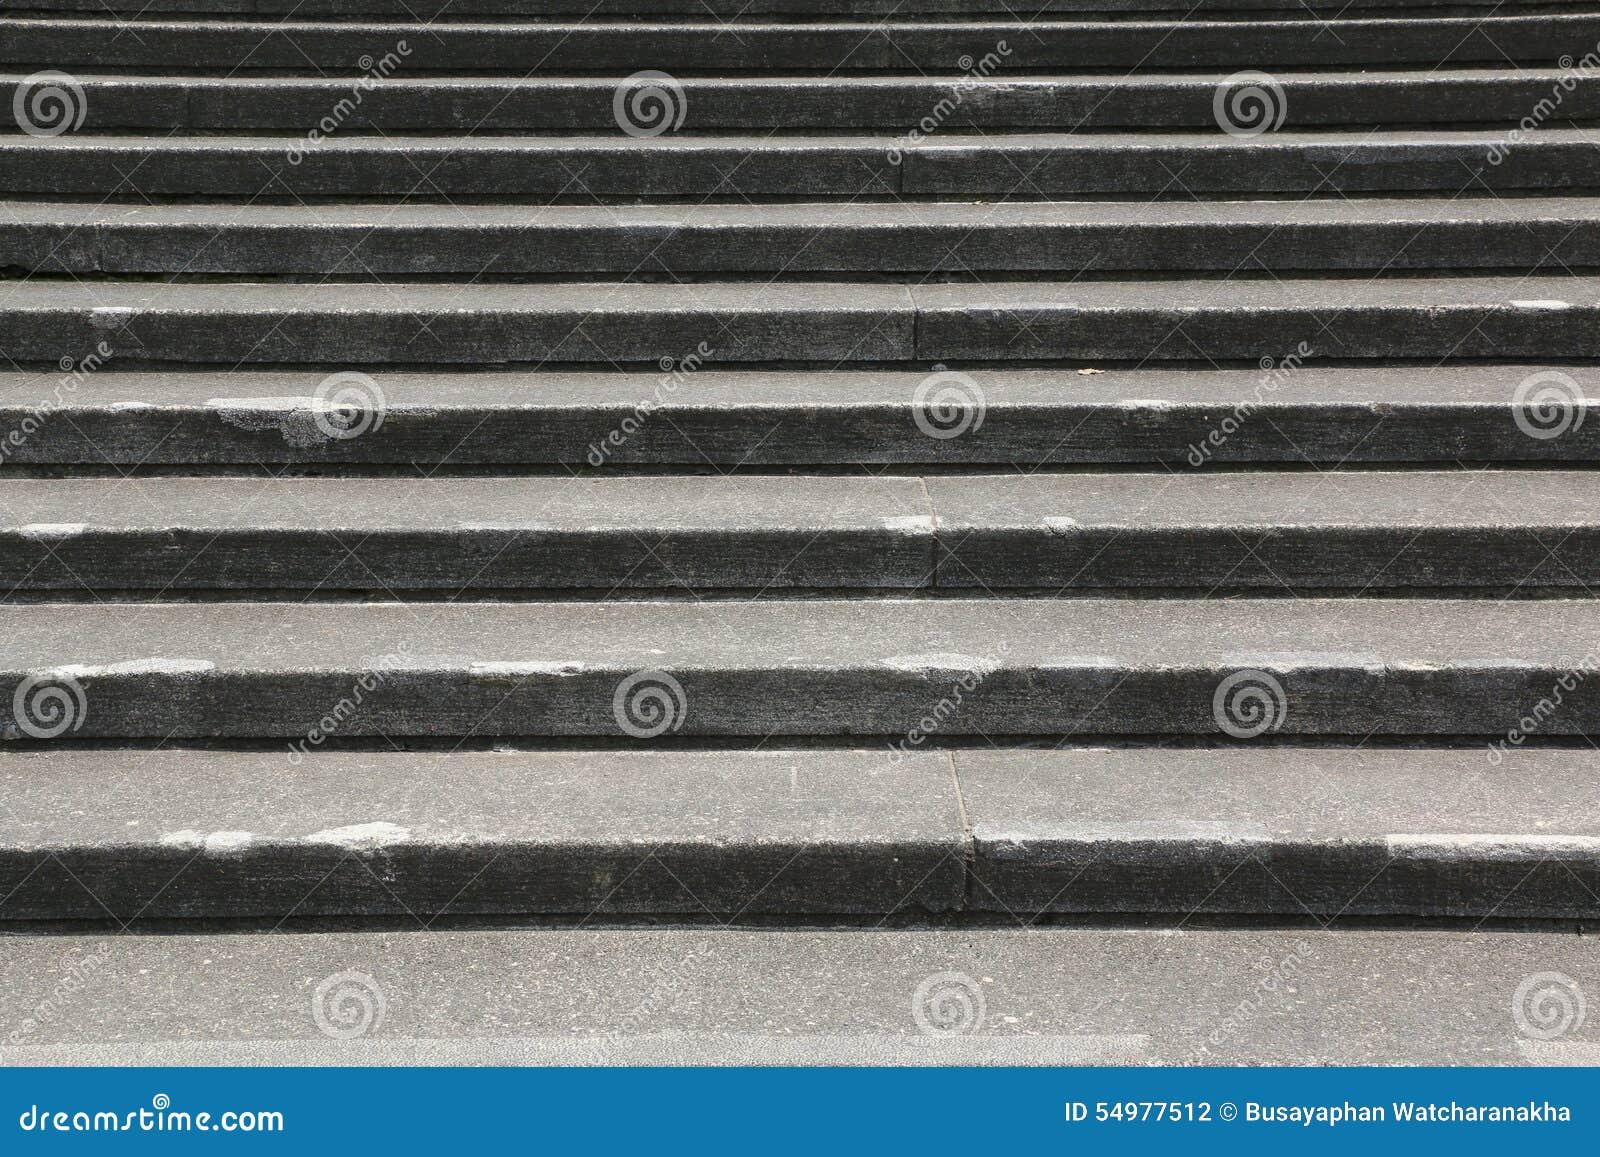 Granite Stairway Background